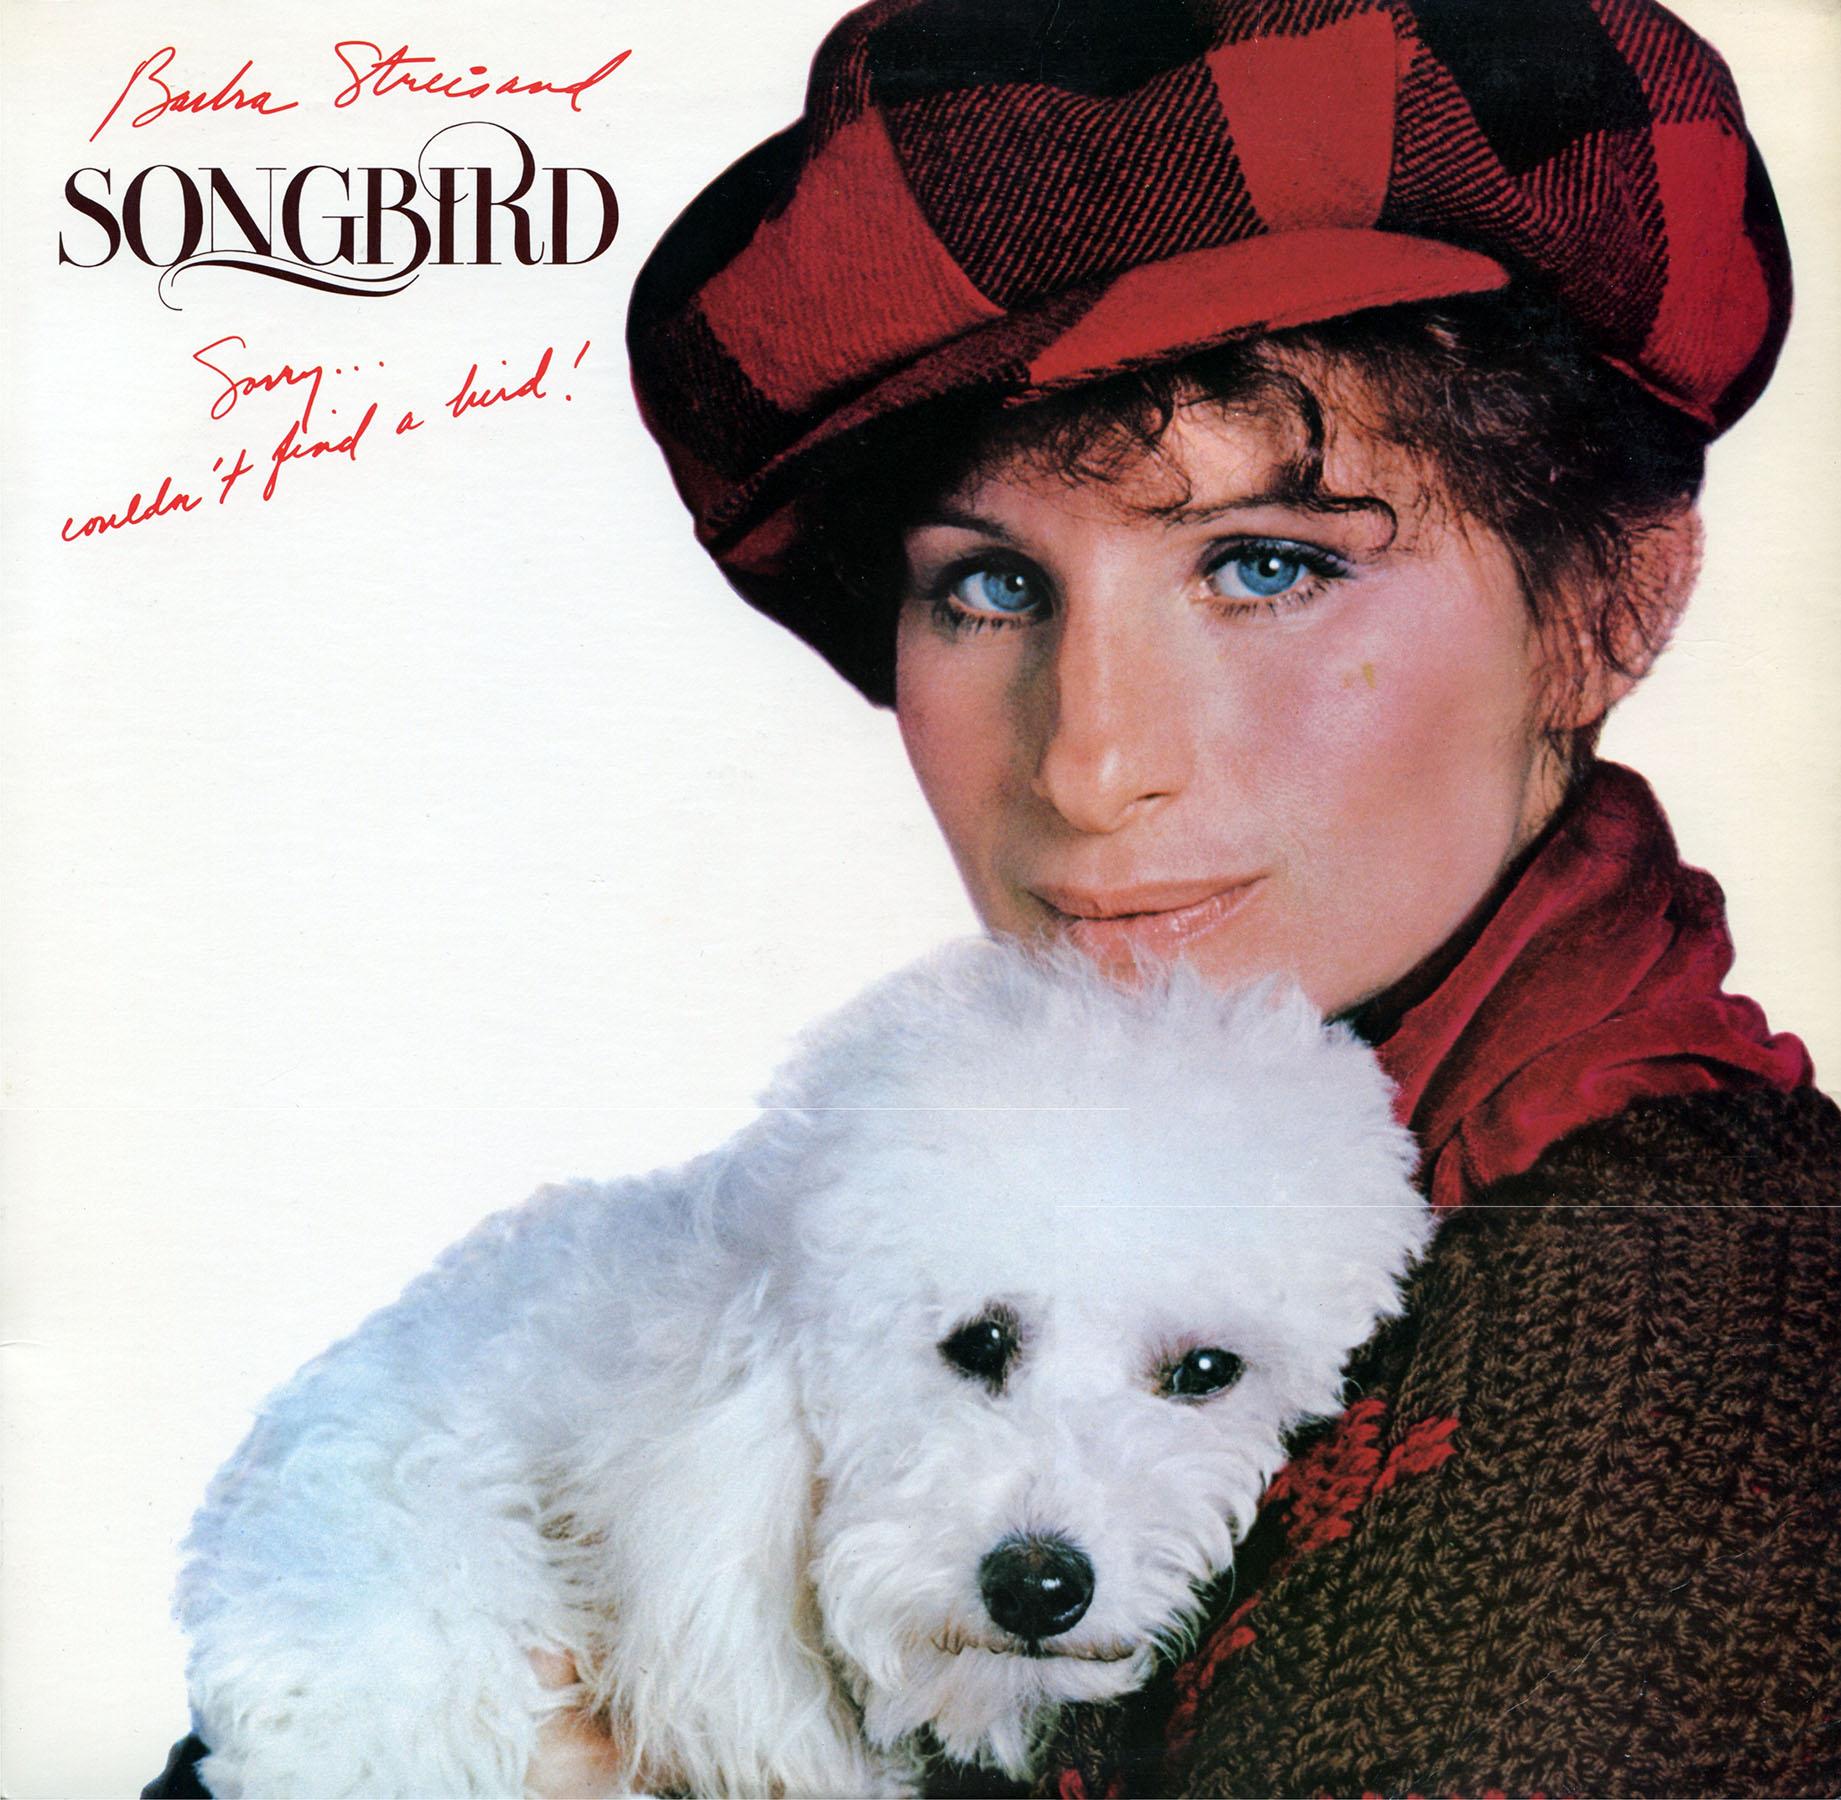 1978 Barbra Streisand – Songbird